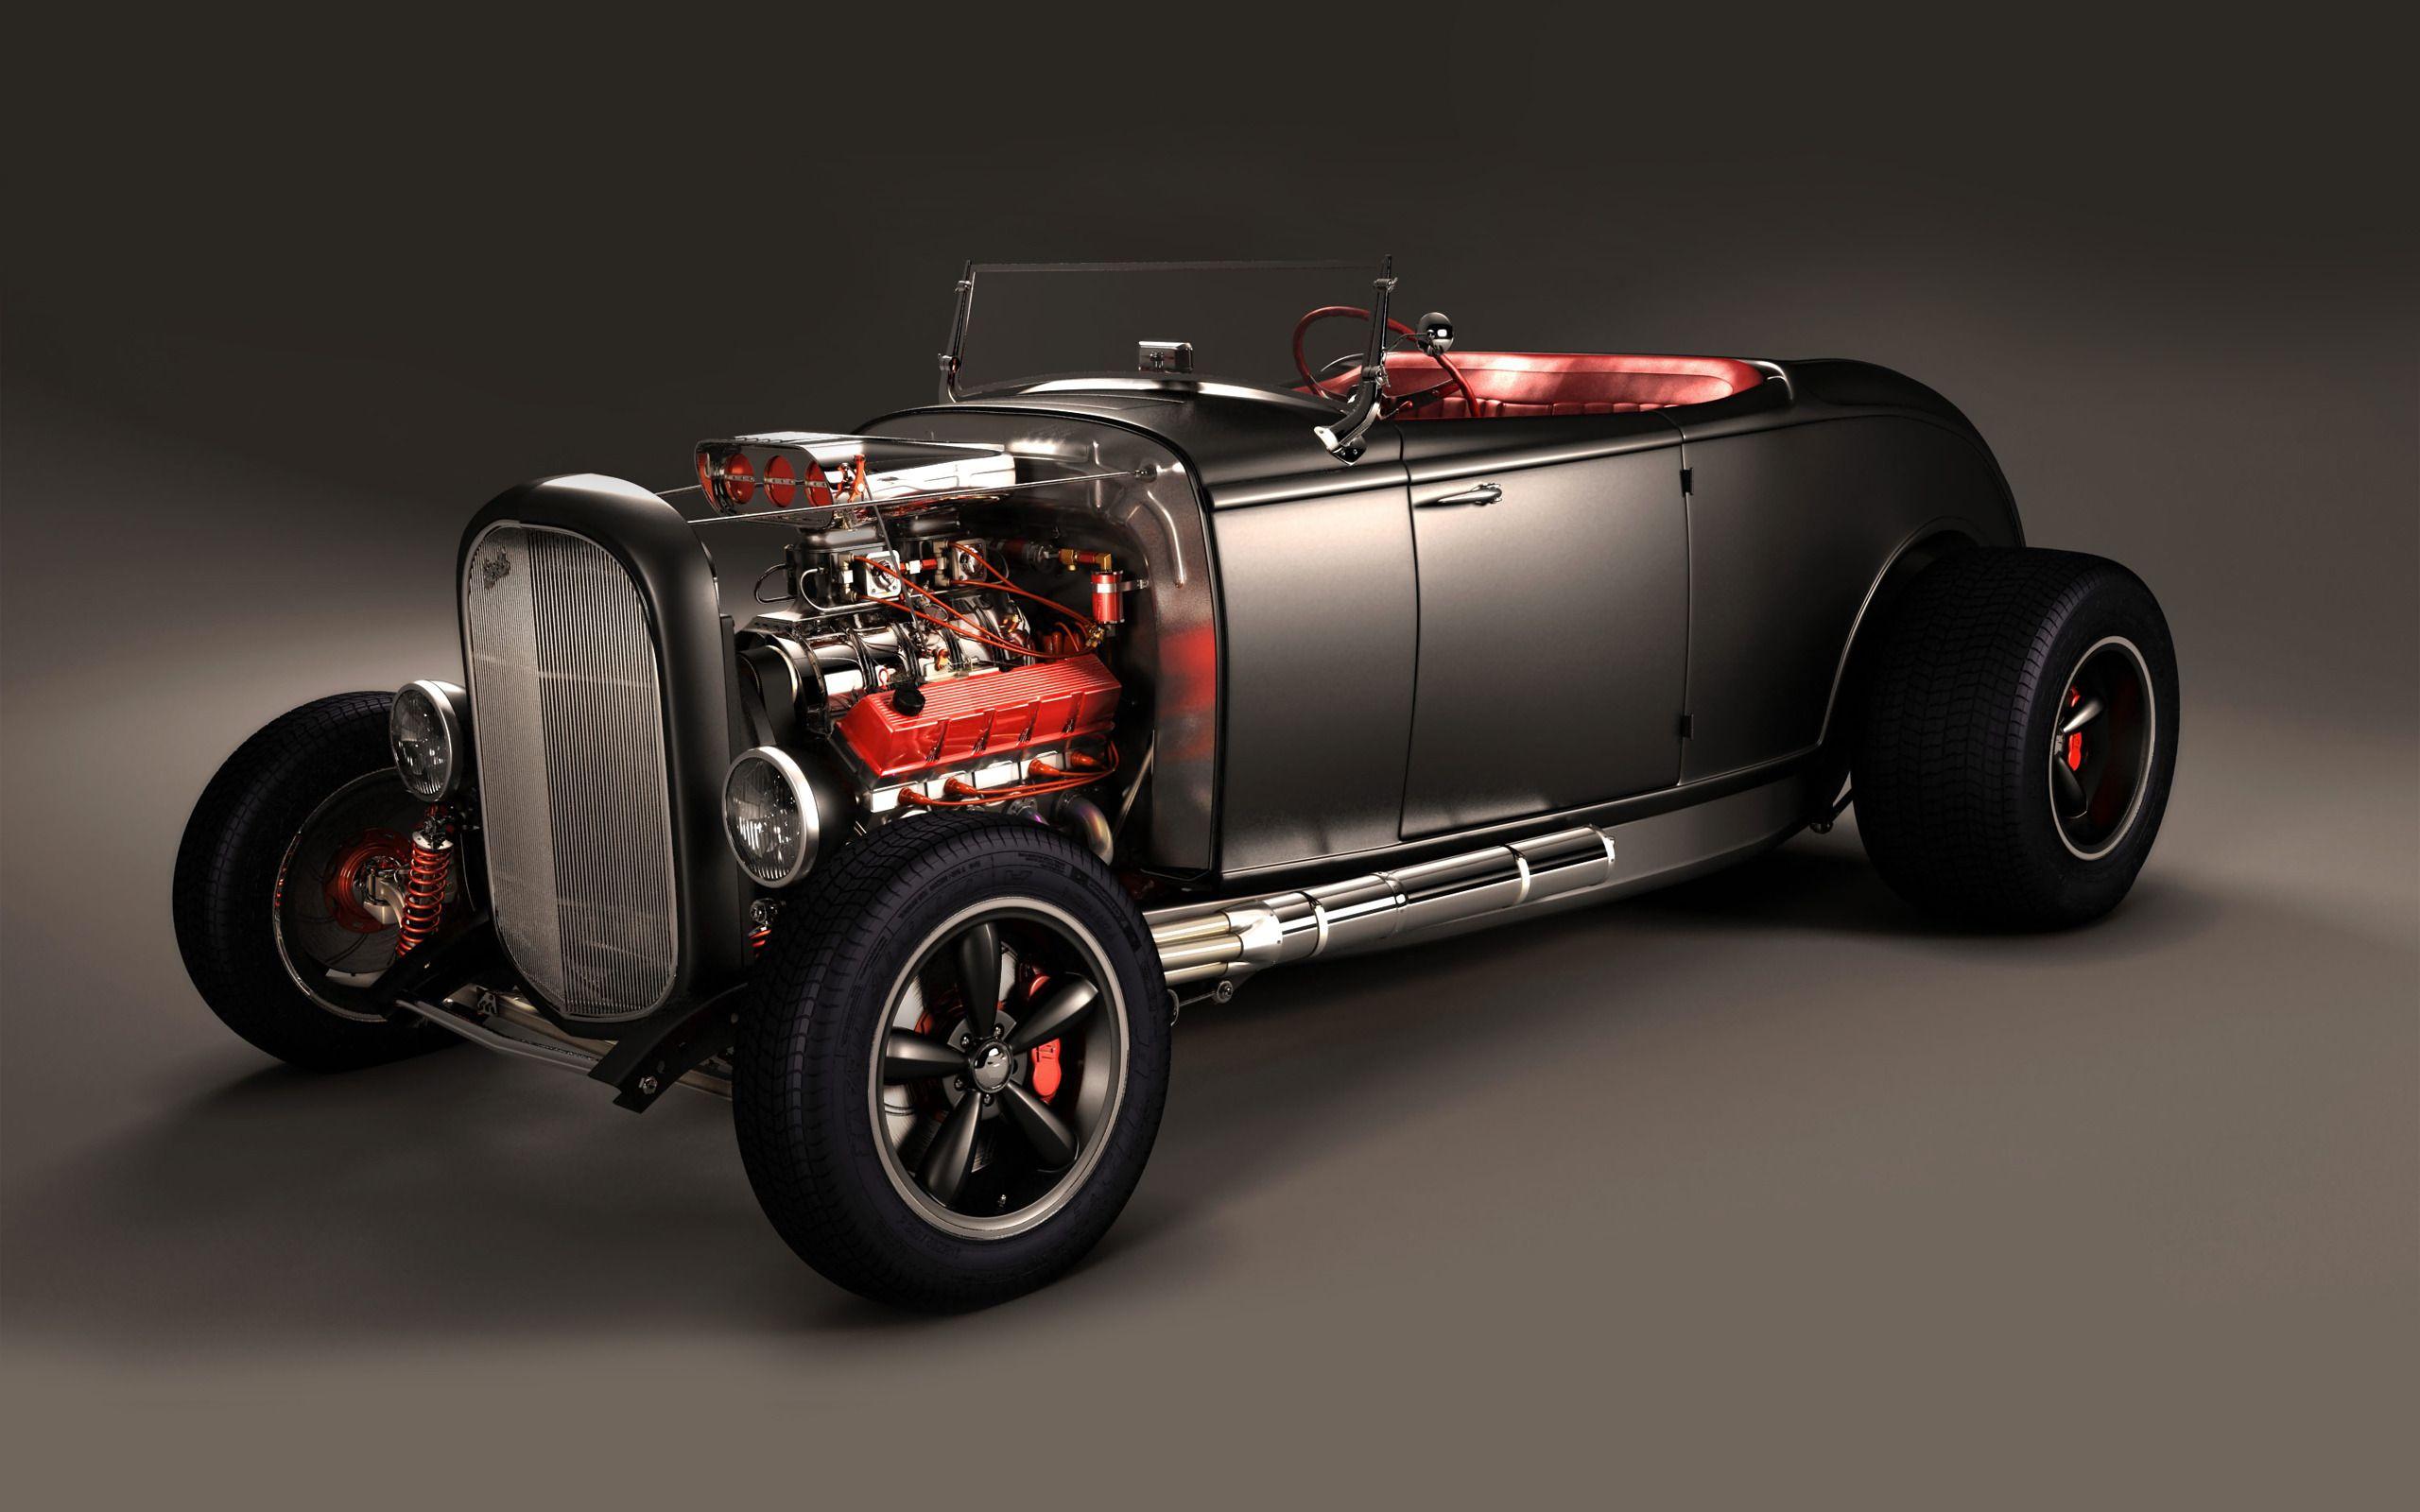 hot rod car ford 32 hot rod car wallpaper